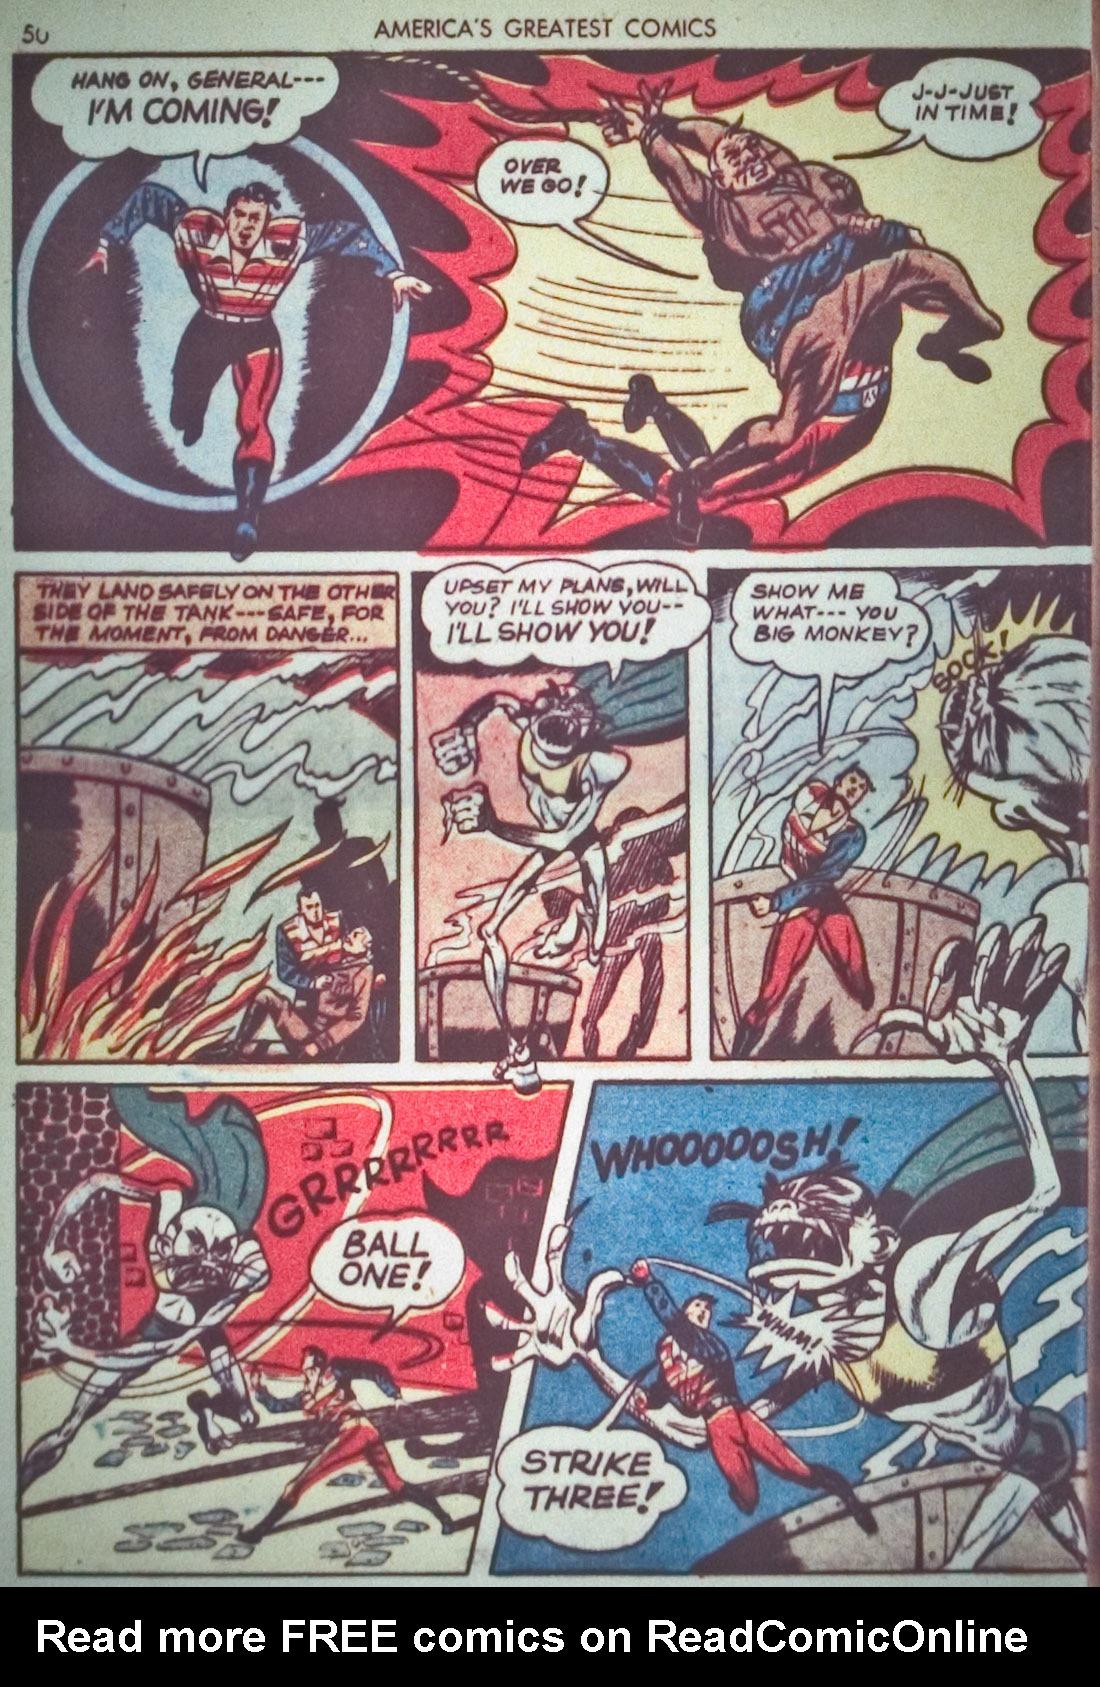 Read online America's Greatest Comics comic -  Issue #1 - 53